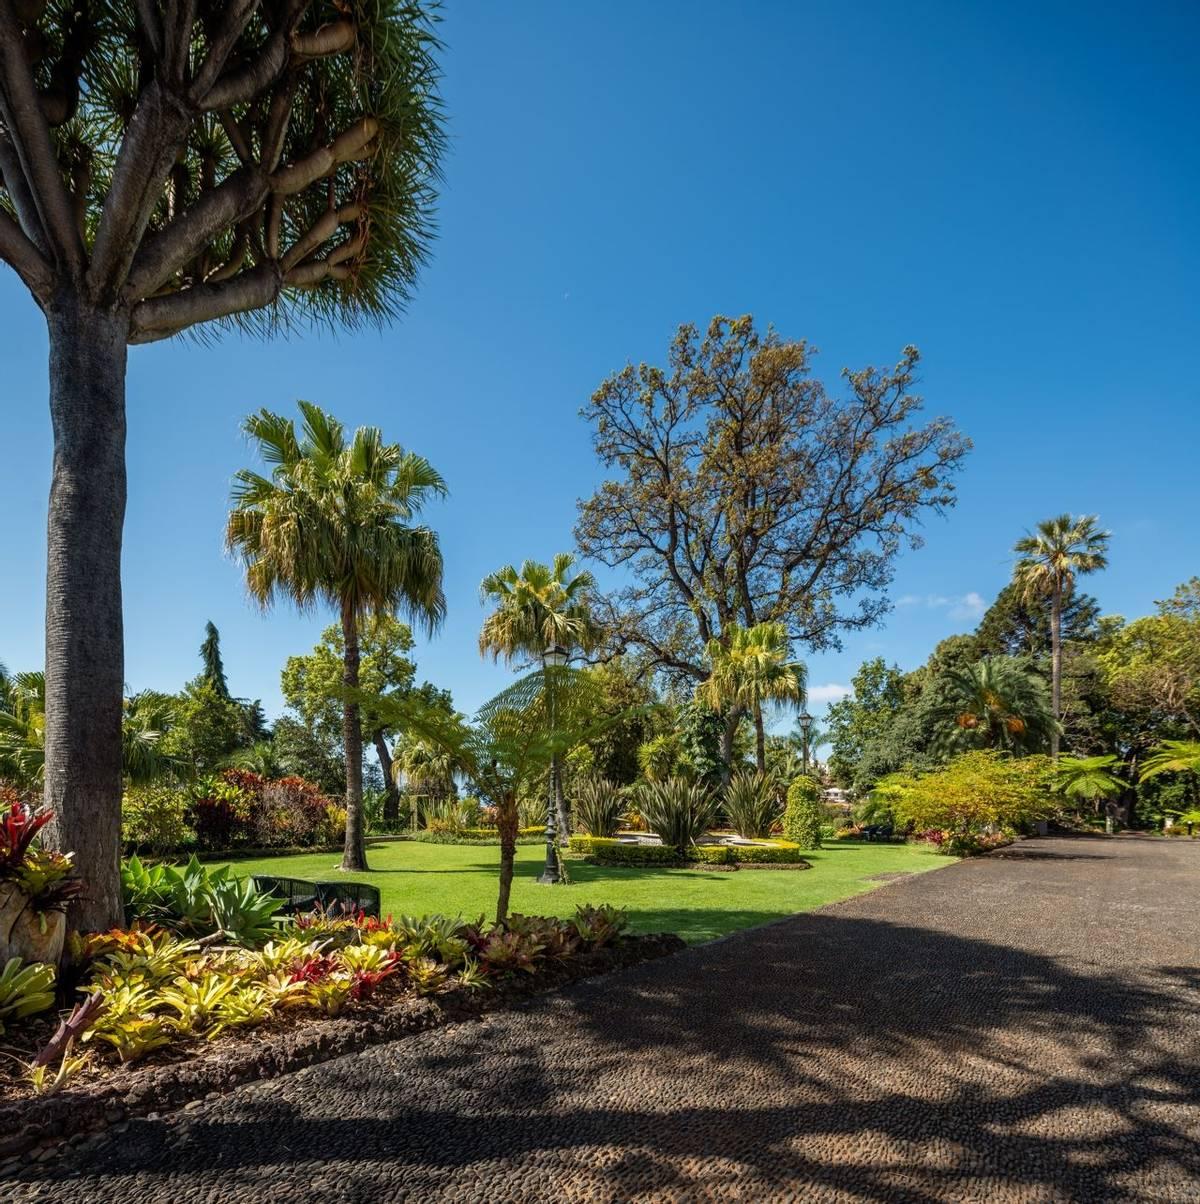 Portugal - Gardens of Madeira - Alberto Reynolds  - 29. QUINTA JARDINS DO LAGO GARDENS.jpg